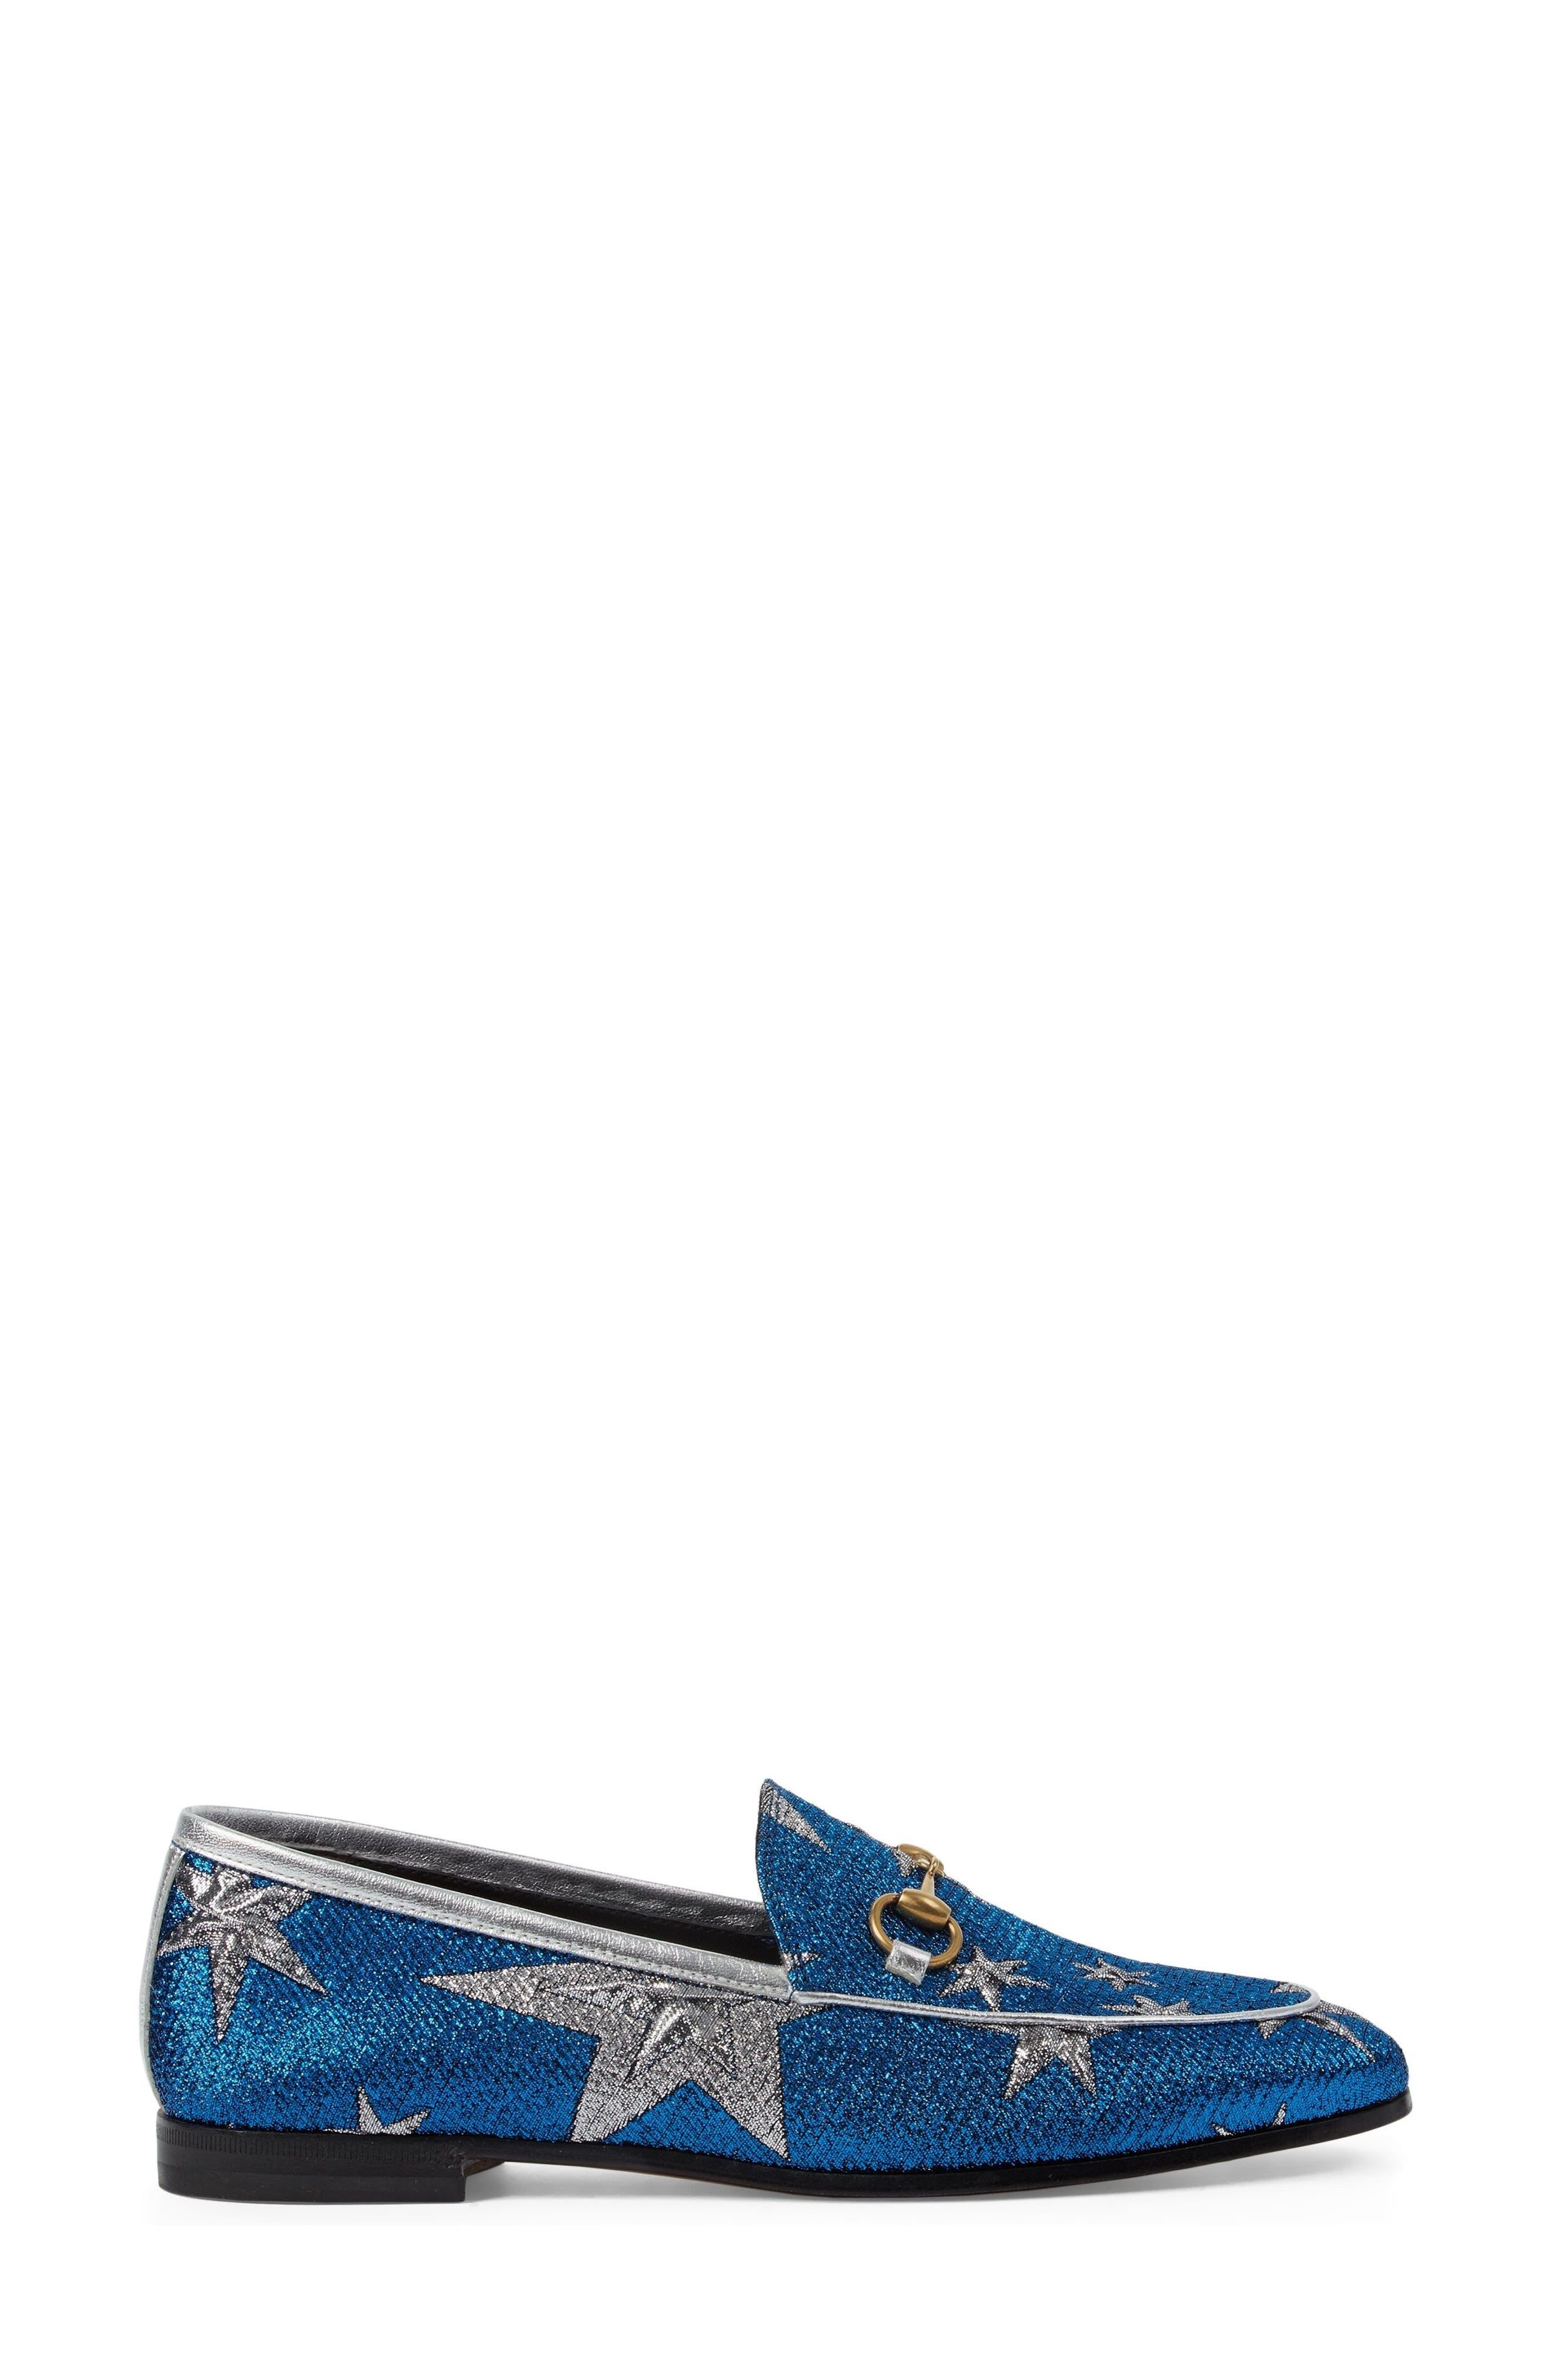 Alternate Image 3  - Gucci Brixton Star Loafer (Women)